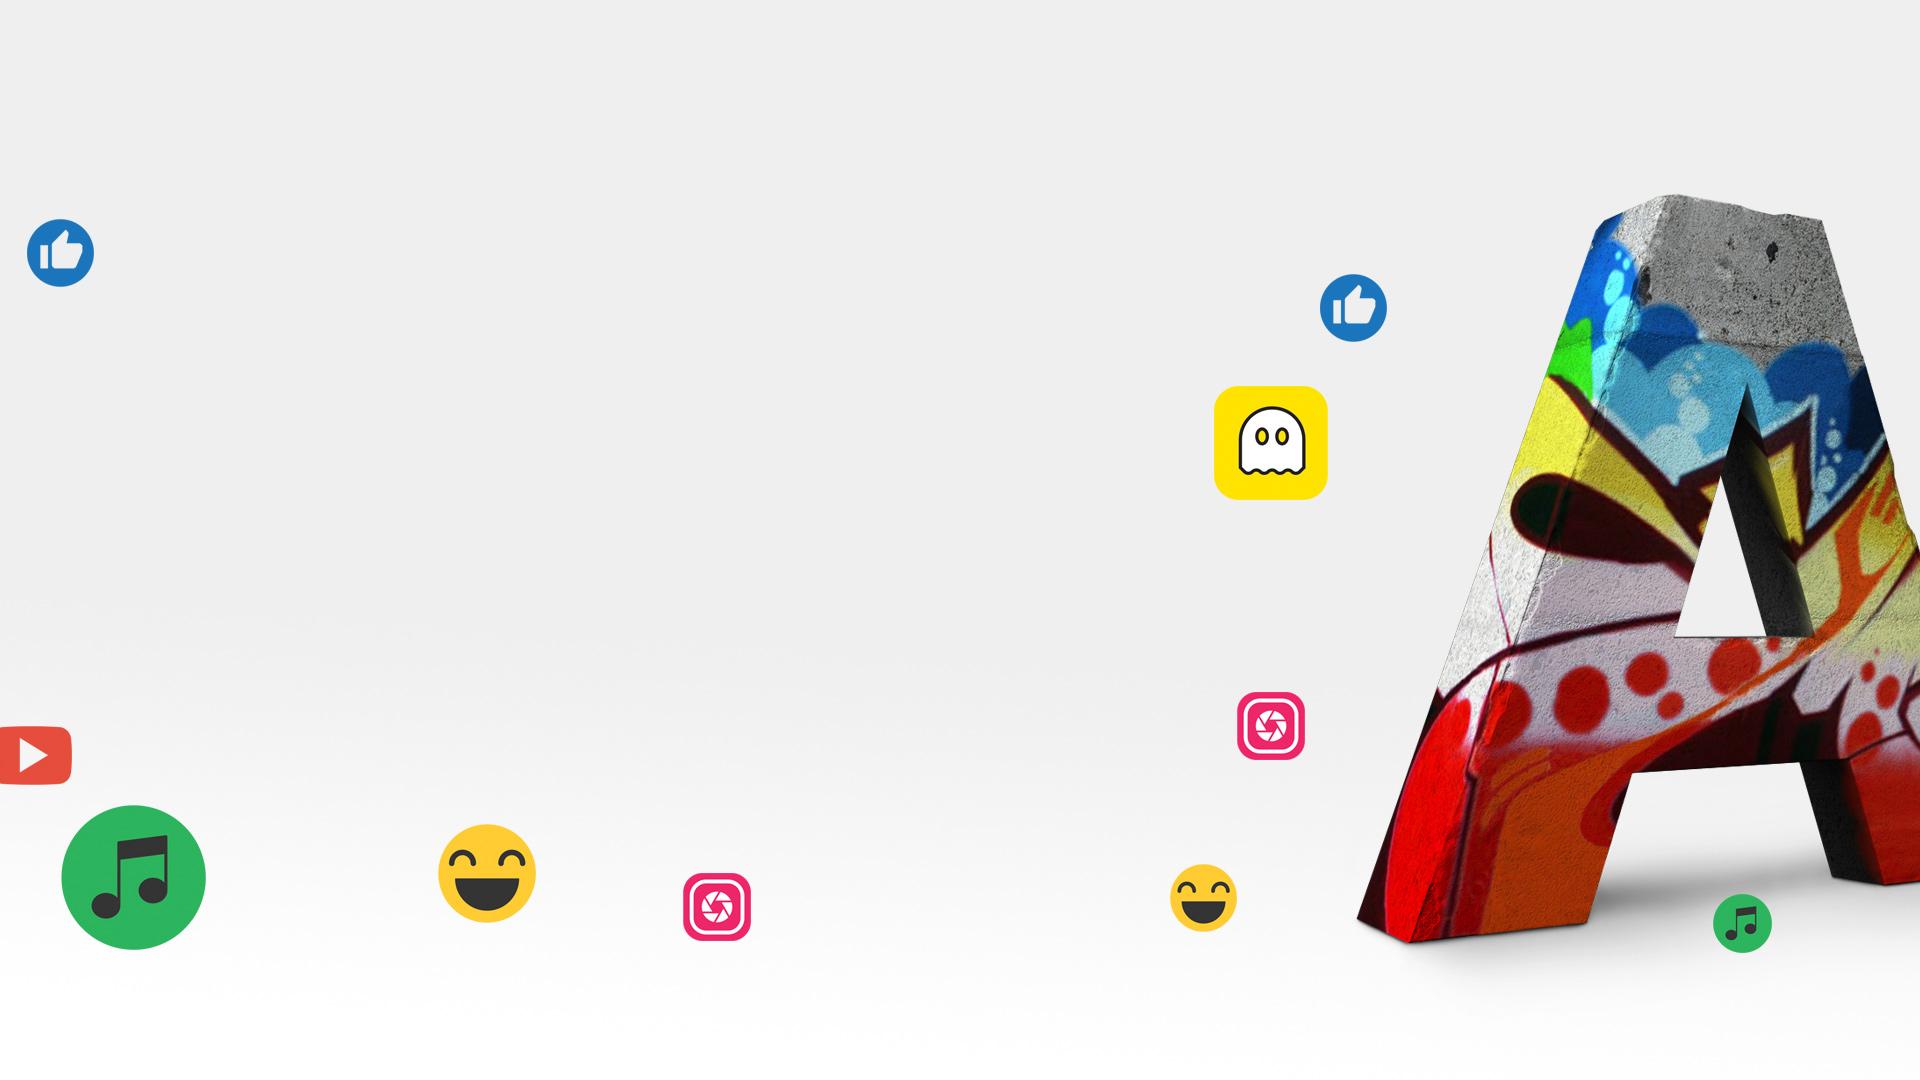 Graffiti-A mit bekannten App Icons